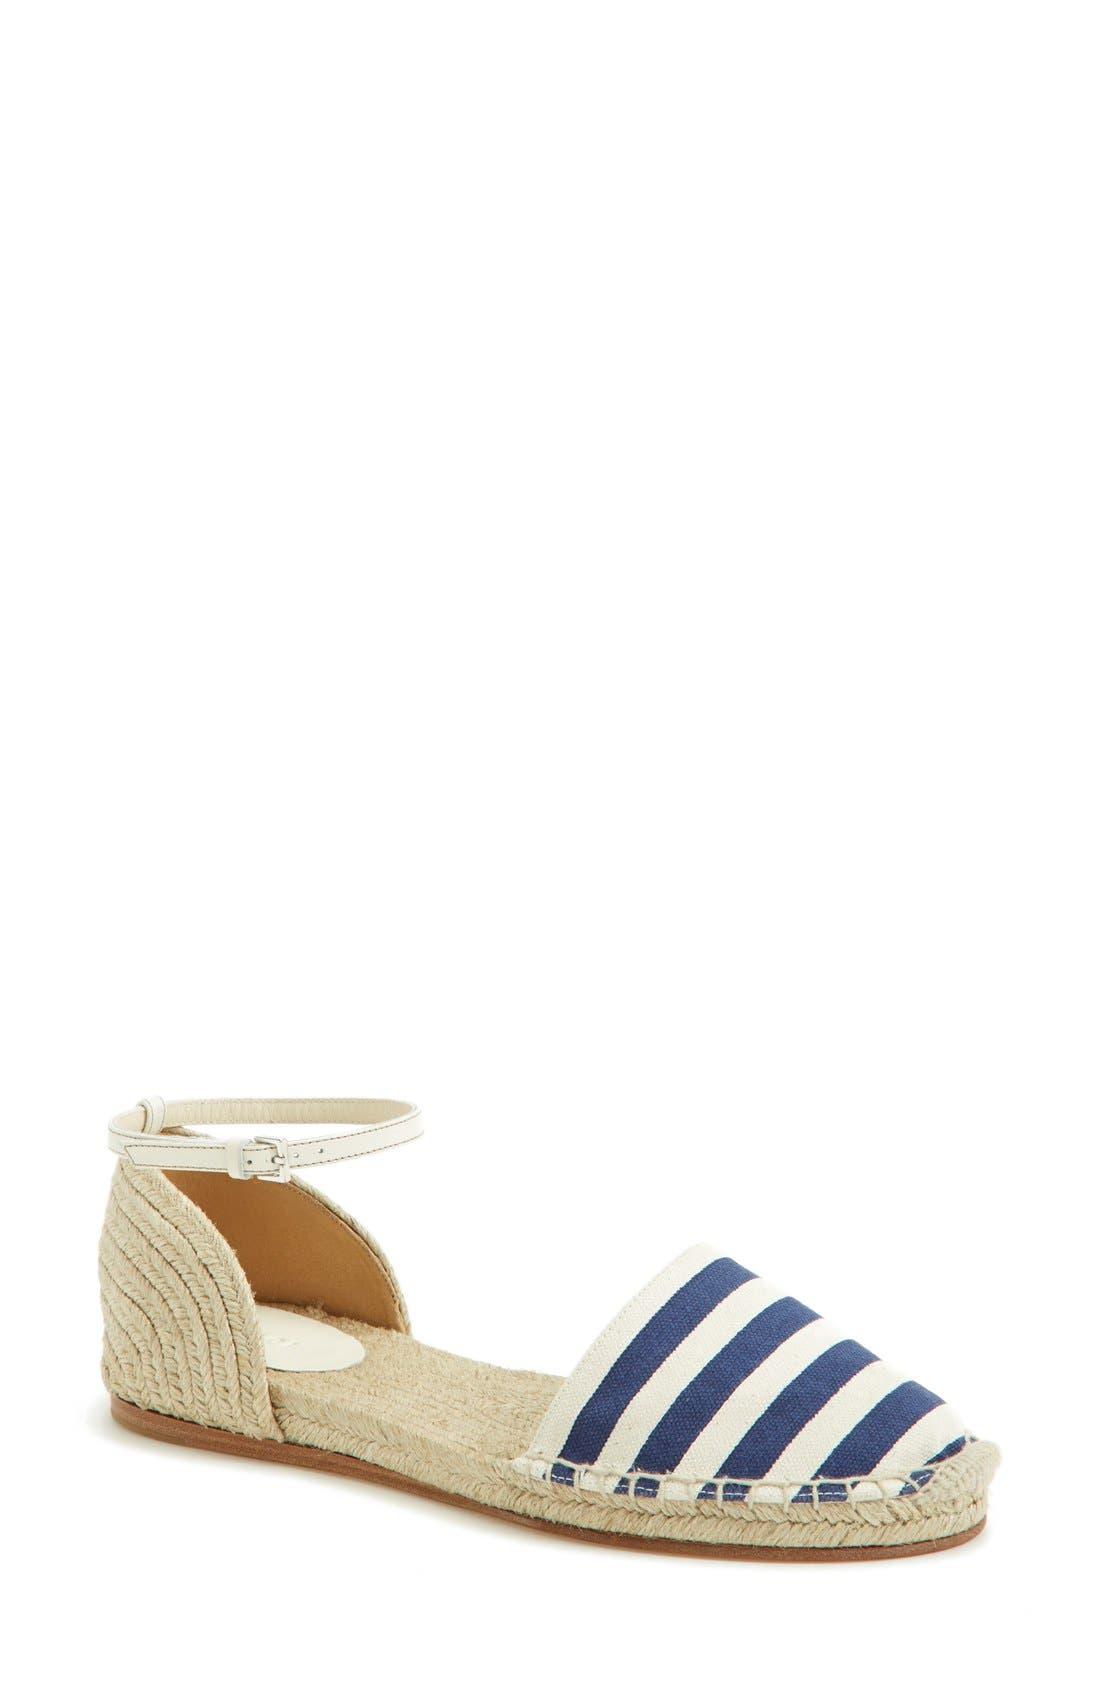 Alternate Image 1 Selected - Gucci 'Veronique' Ankle Strap d'Orsay Espadrille Flat (Women)